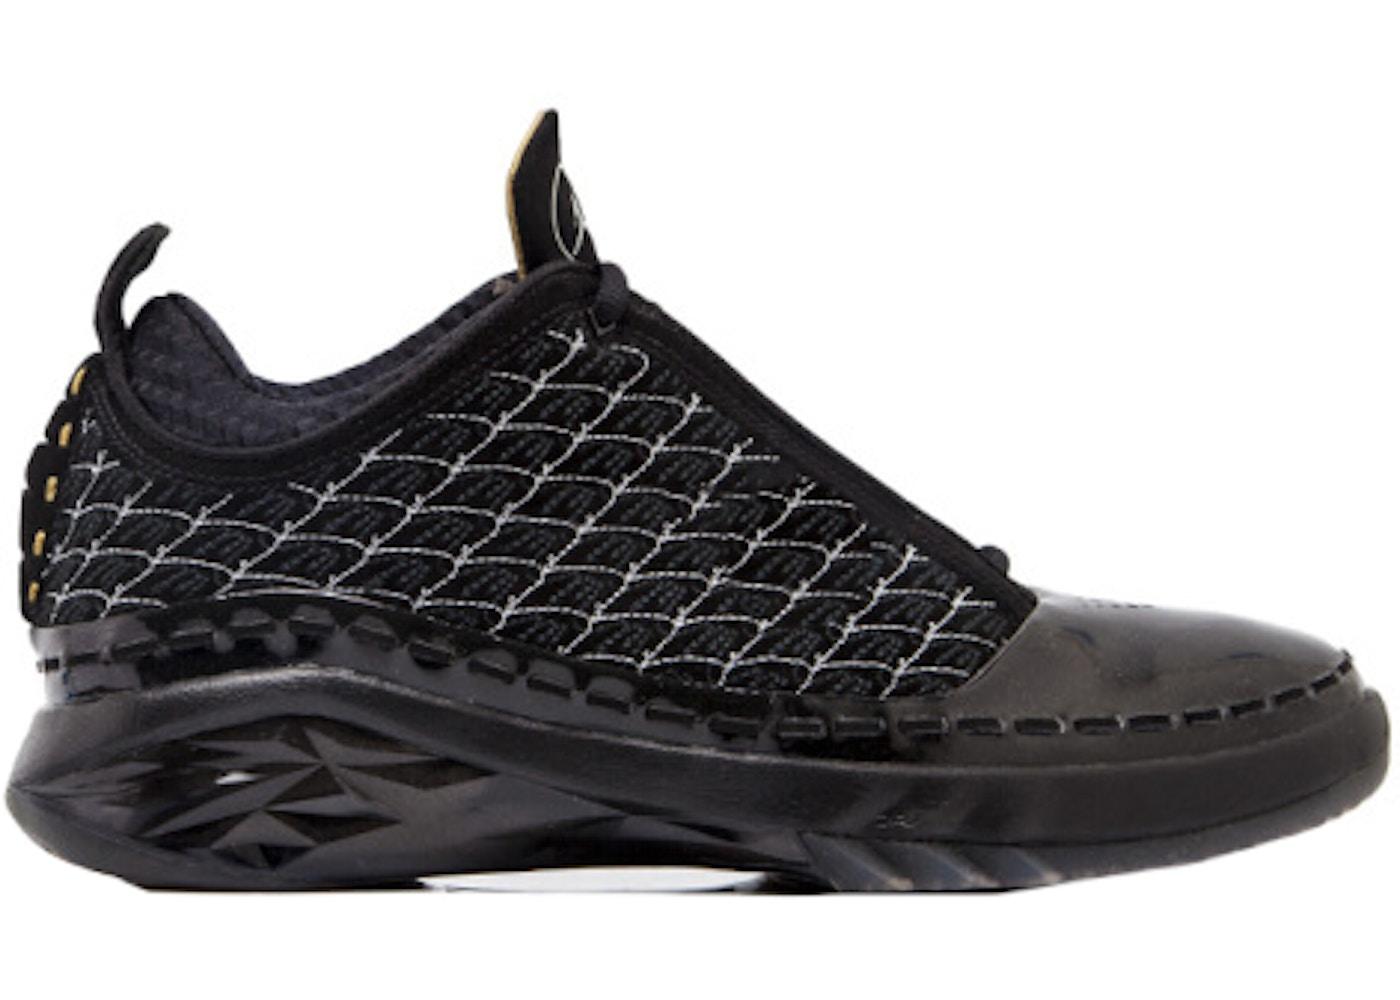 2e79671cb123 Air Jordan 23 Shoes - Price Premium